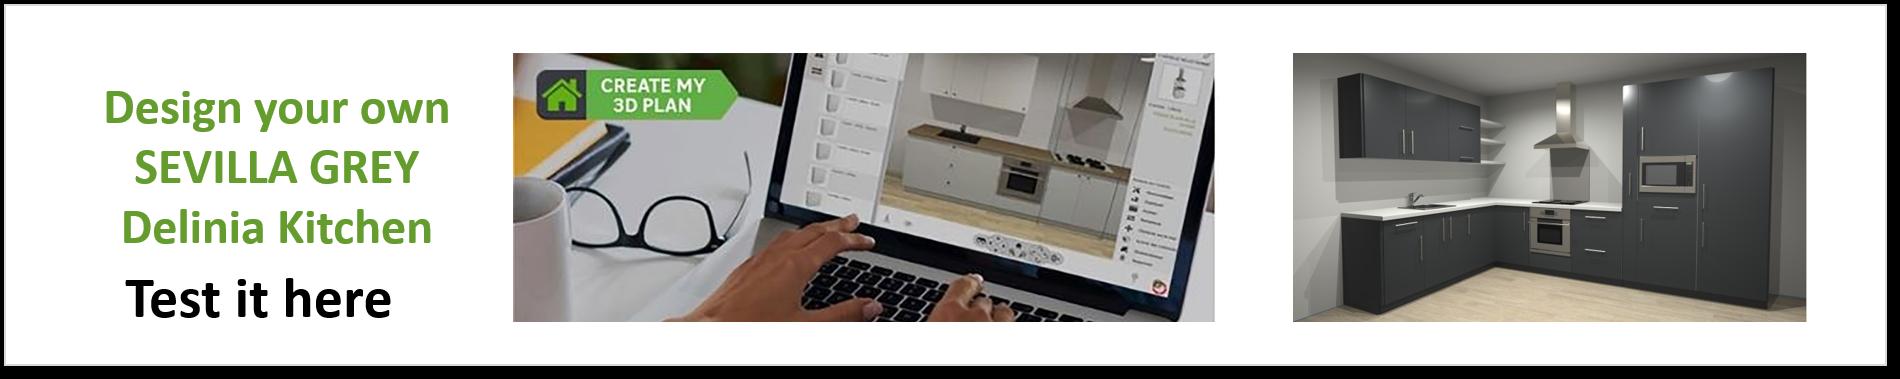 Create or Design your own Delinia Sevilla Grey Designer Kitchen